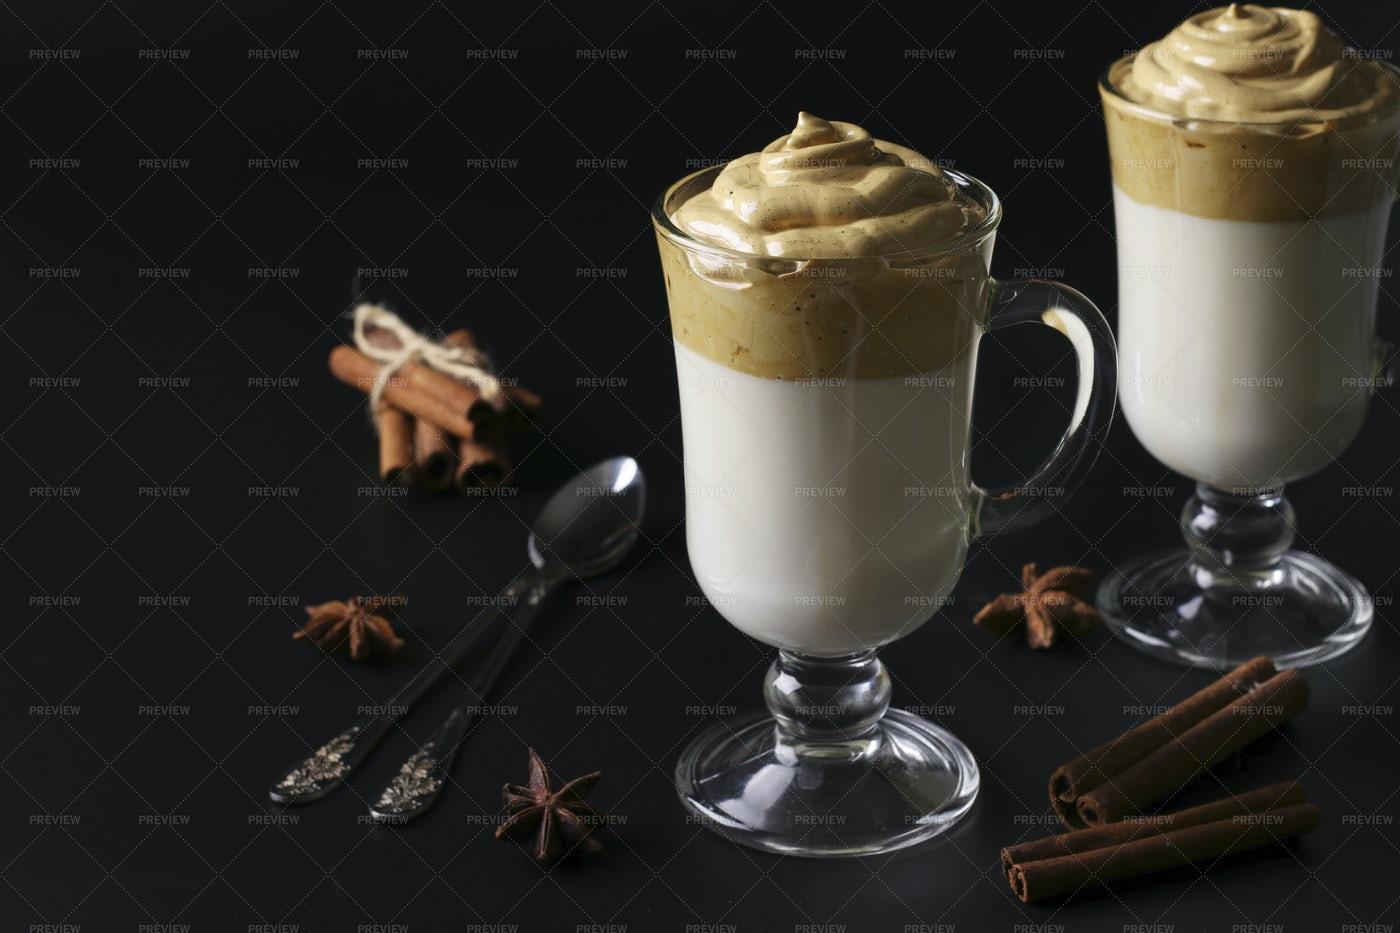 Creamy Coffee In Glasses: Stock Photos